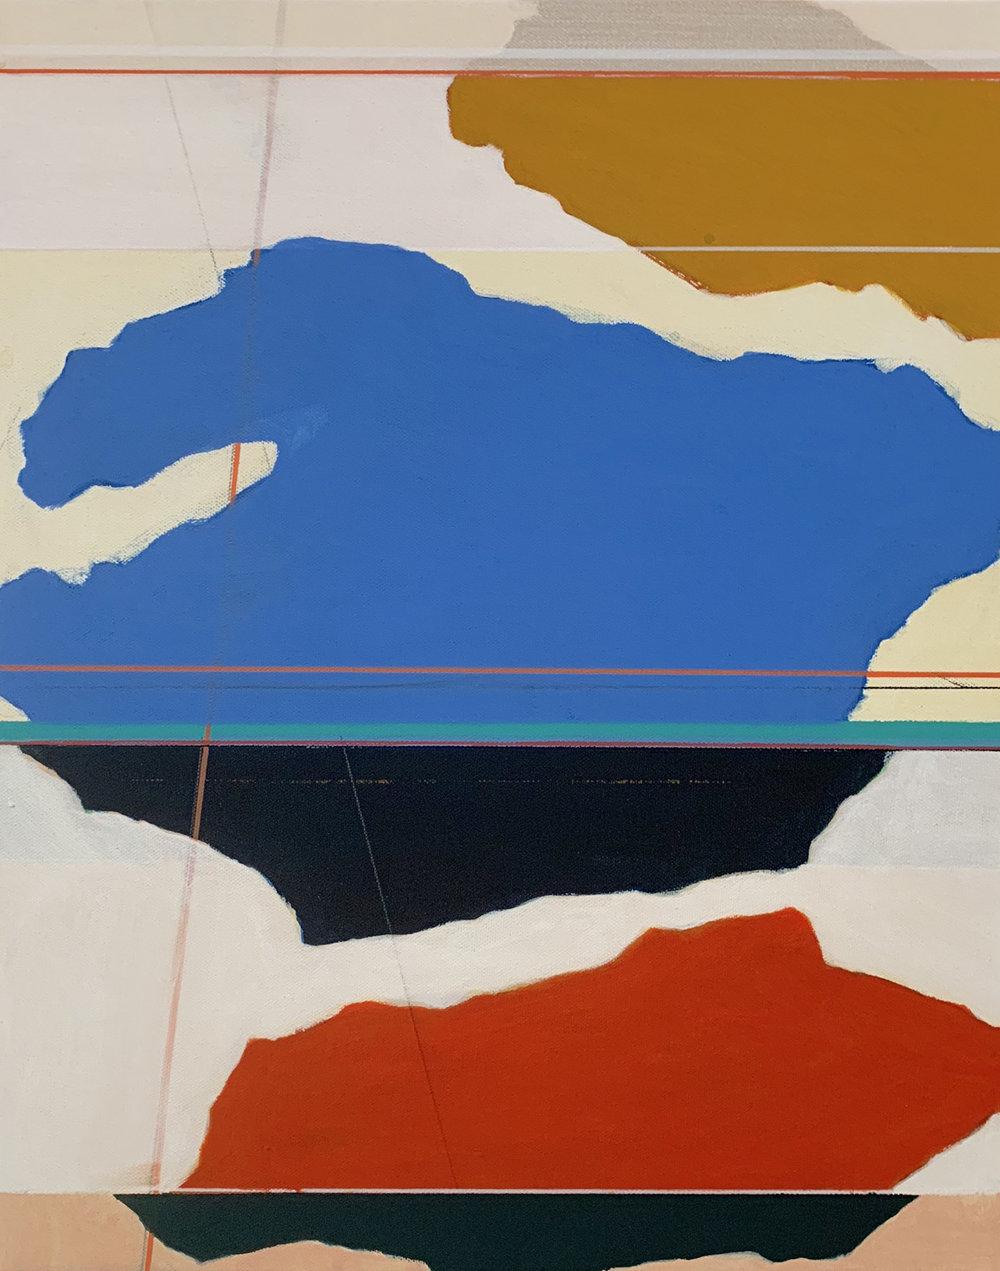 DenaRobertson Untitled AcrylicVinylonCanvas 16x20in 2018 $1275.jpg